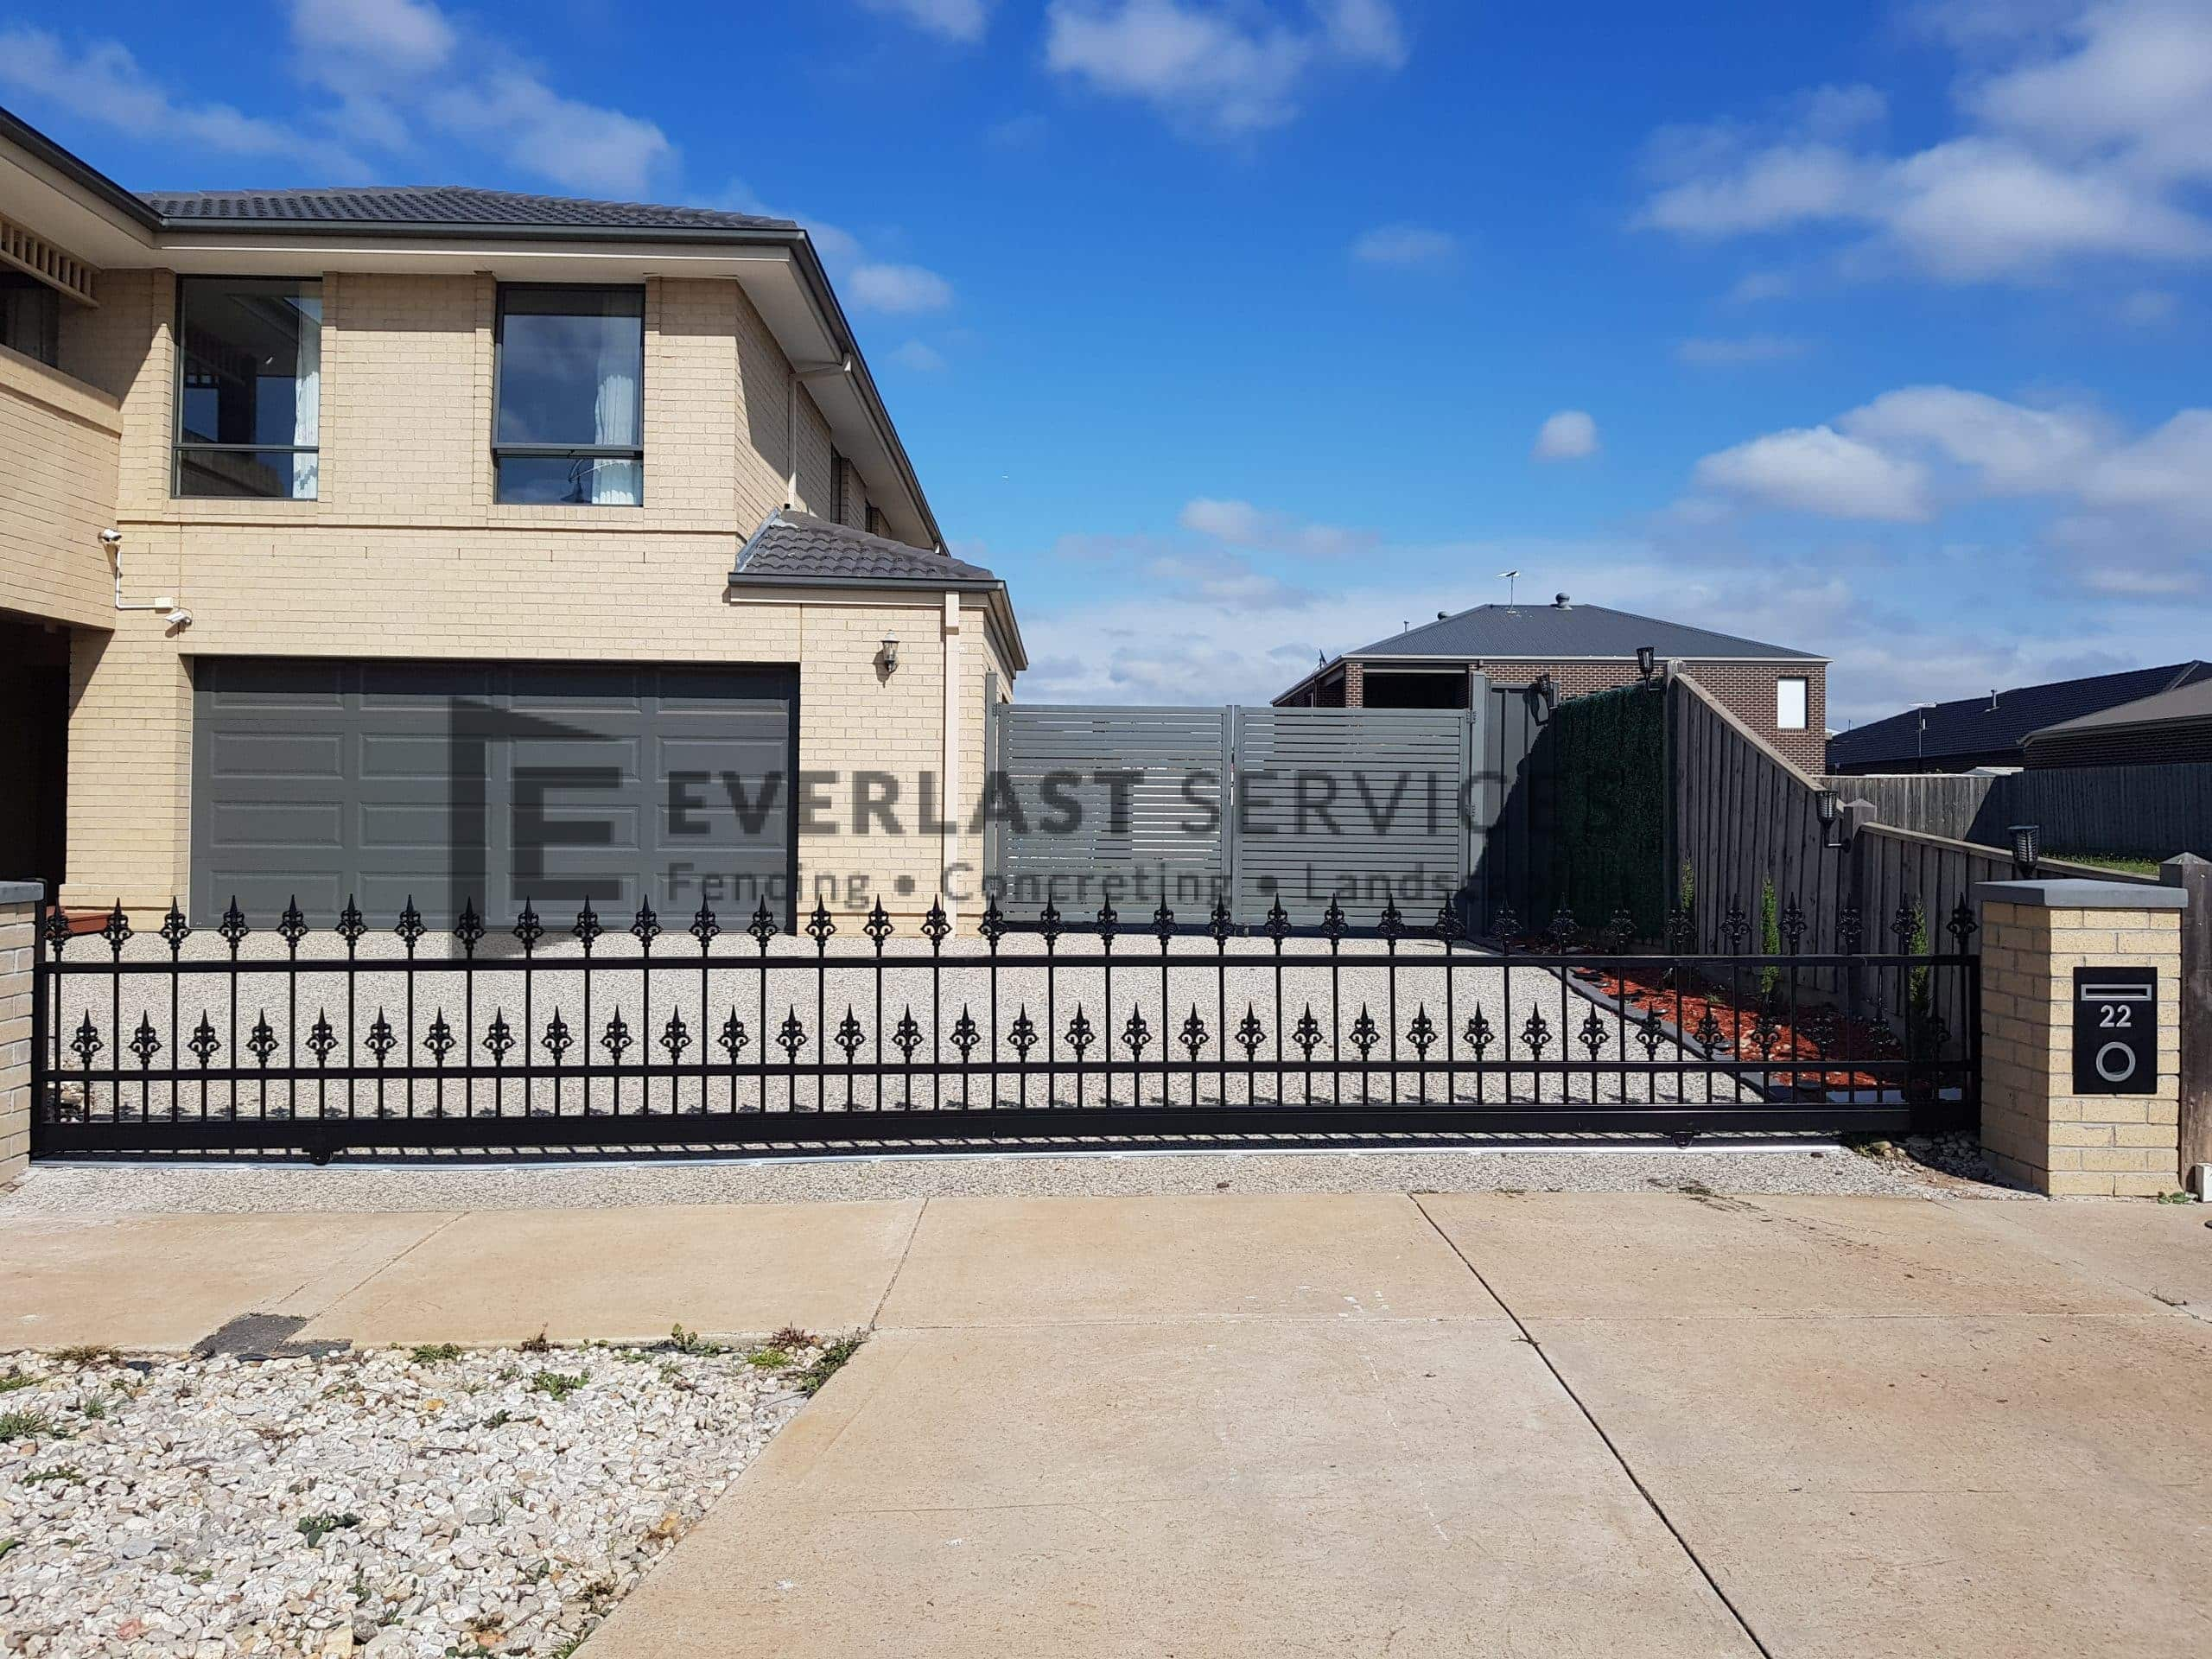 SG86 - Black Steel Fence with sliding gate